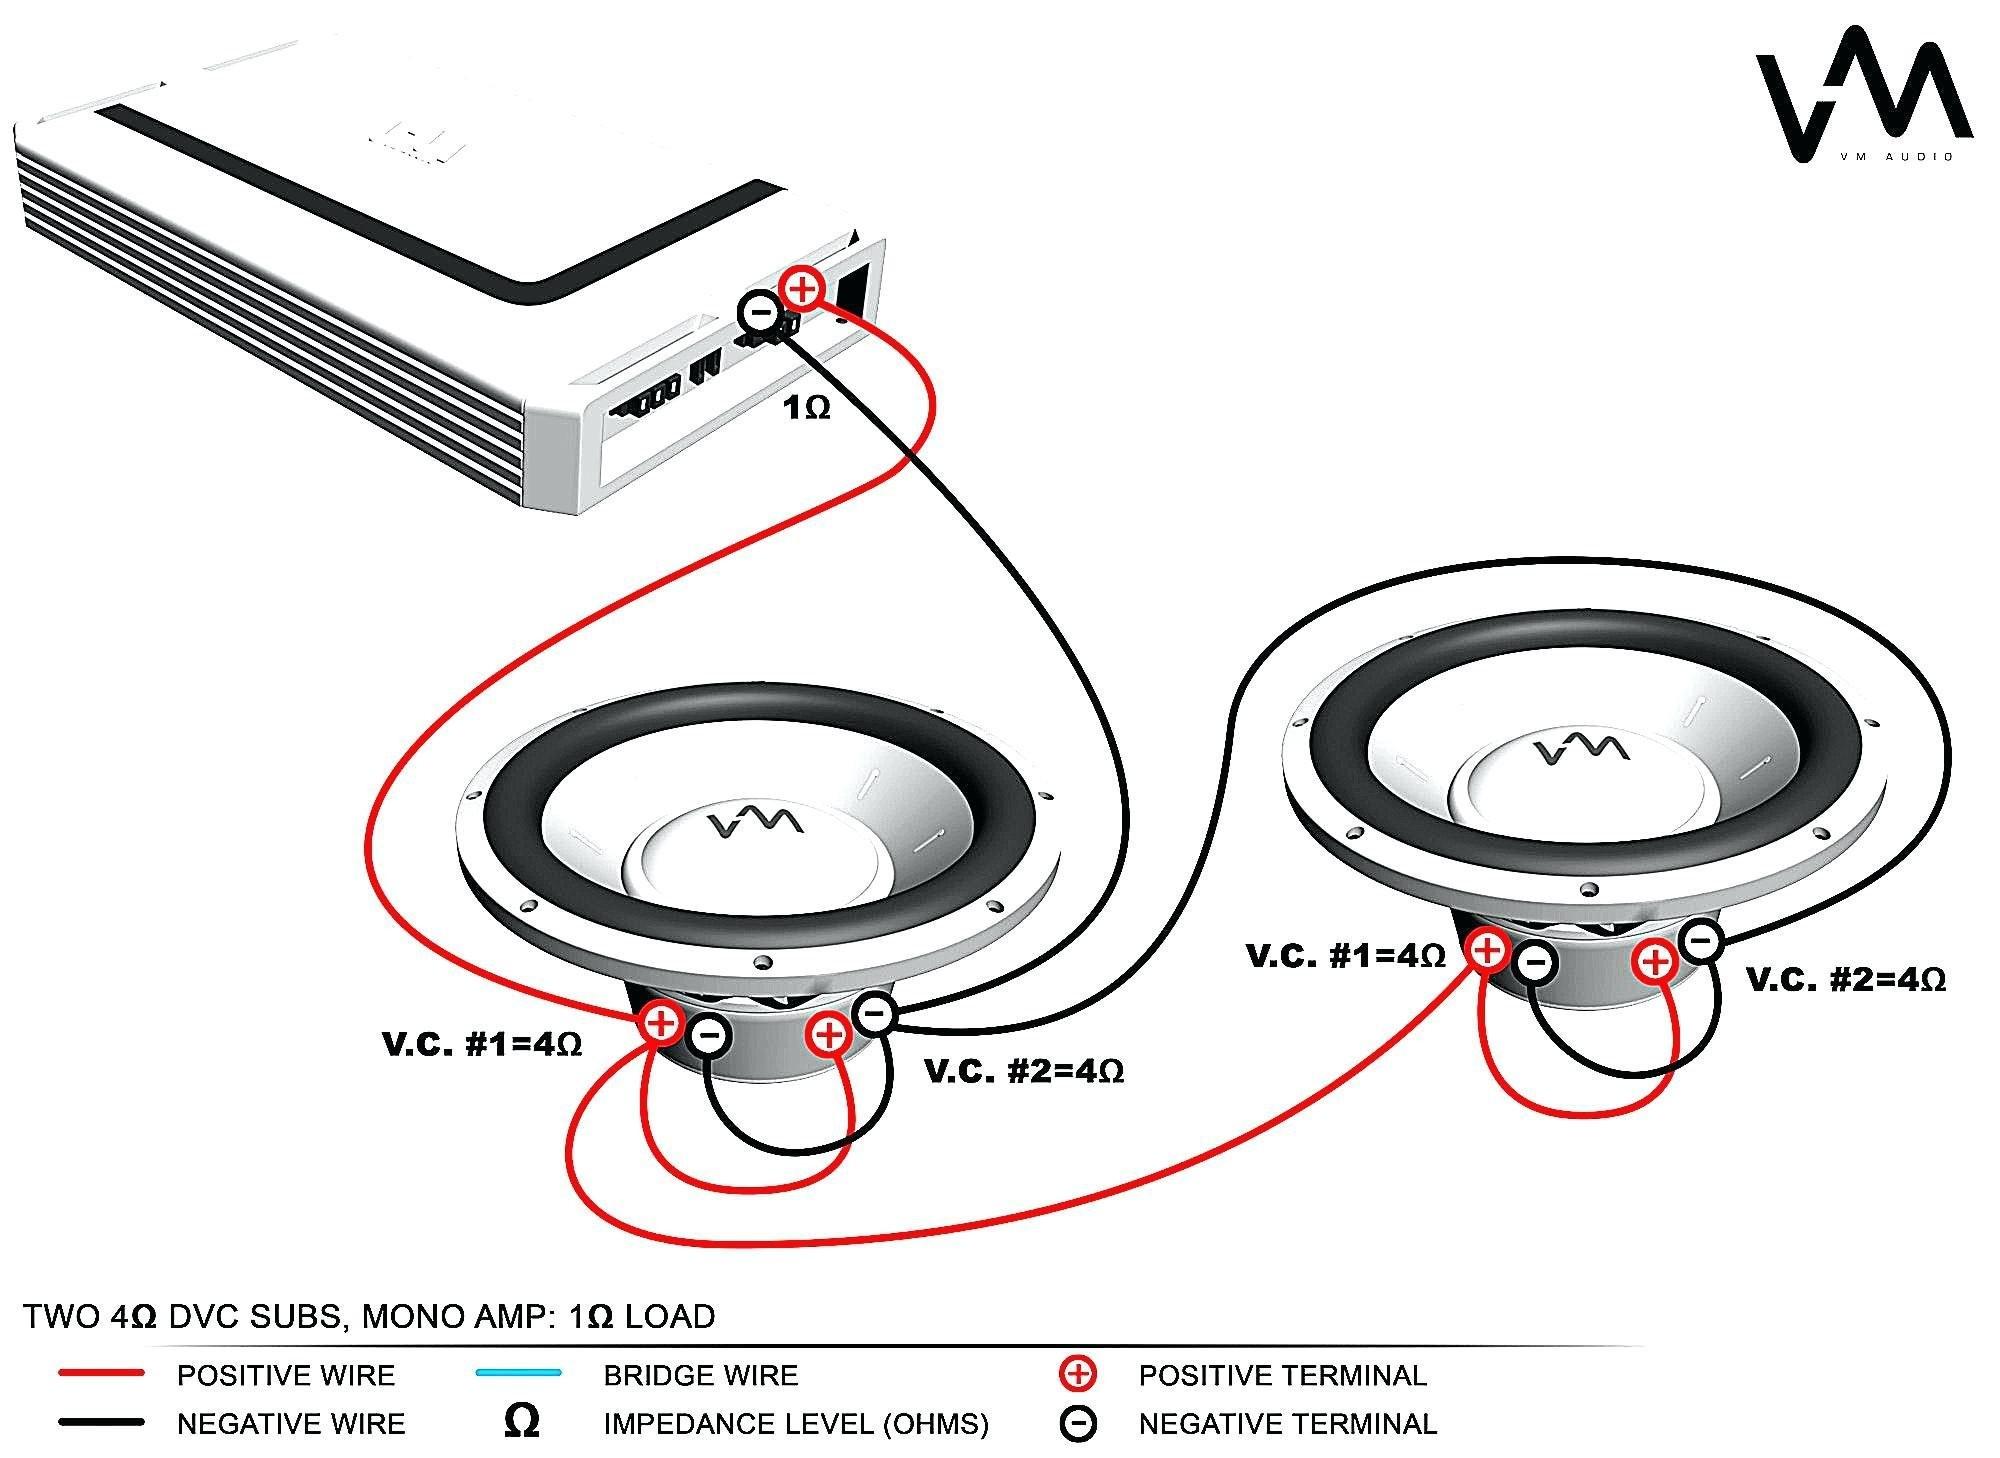 2 2 Ohm Dvc Wiring Diagram Geothermal Power Plant Schematic Diagram Oonboard Yenpancane Jeanjaures37 Fr